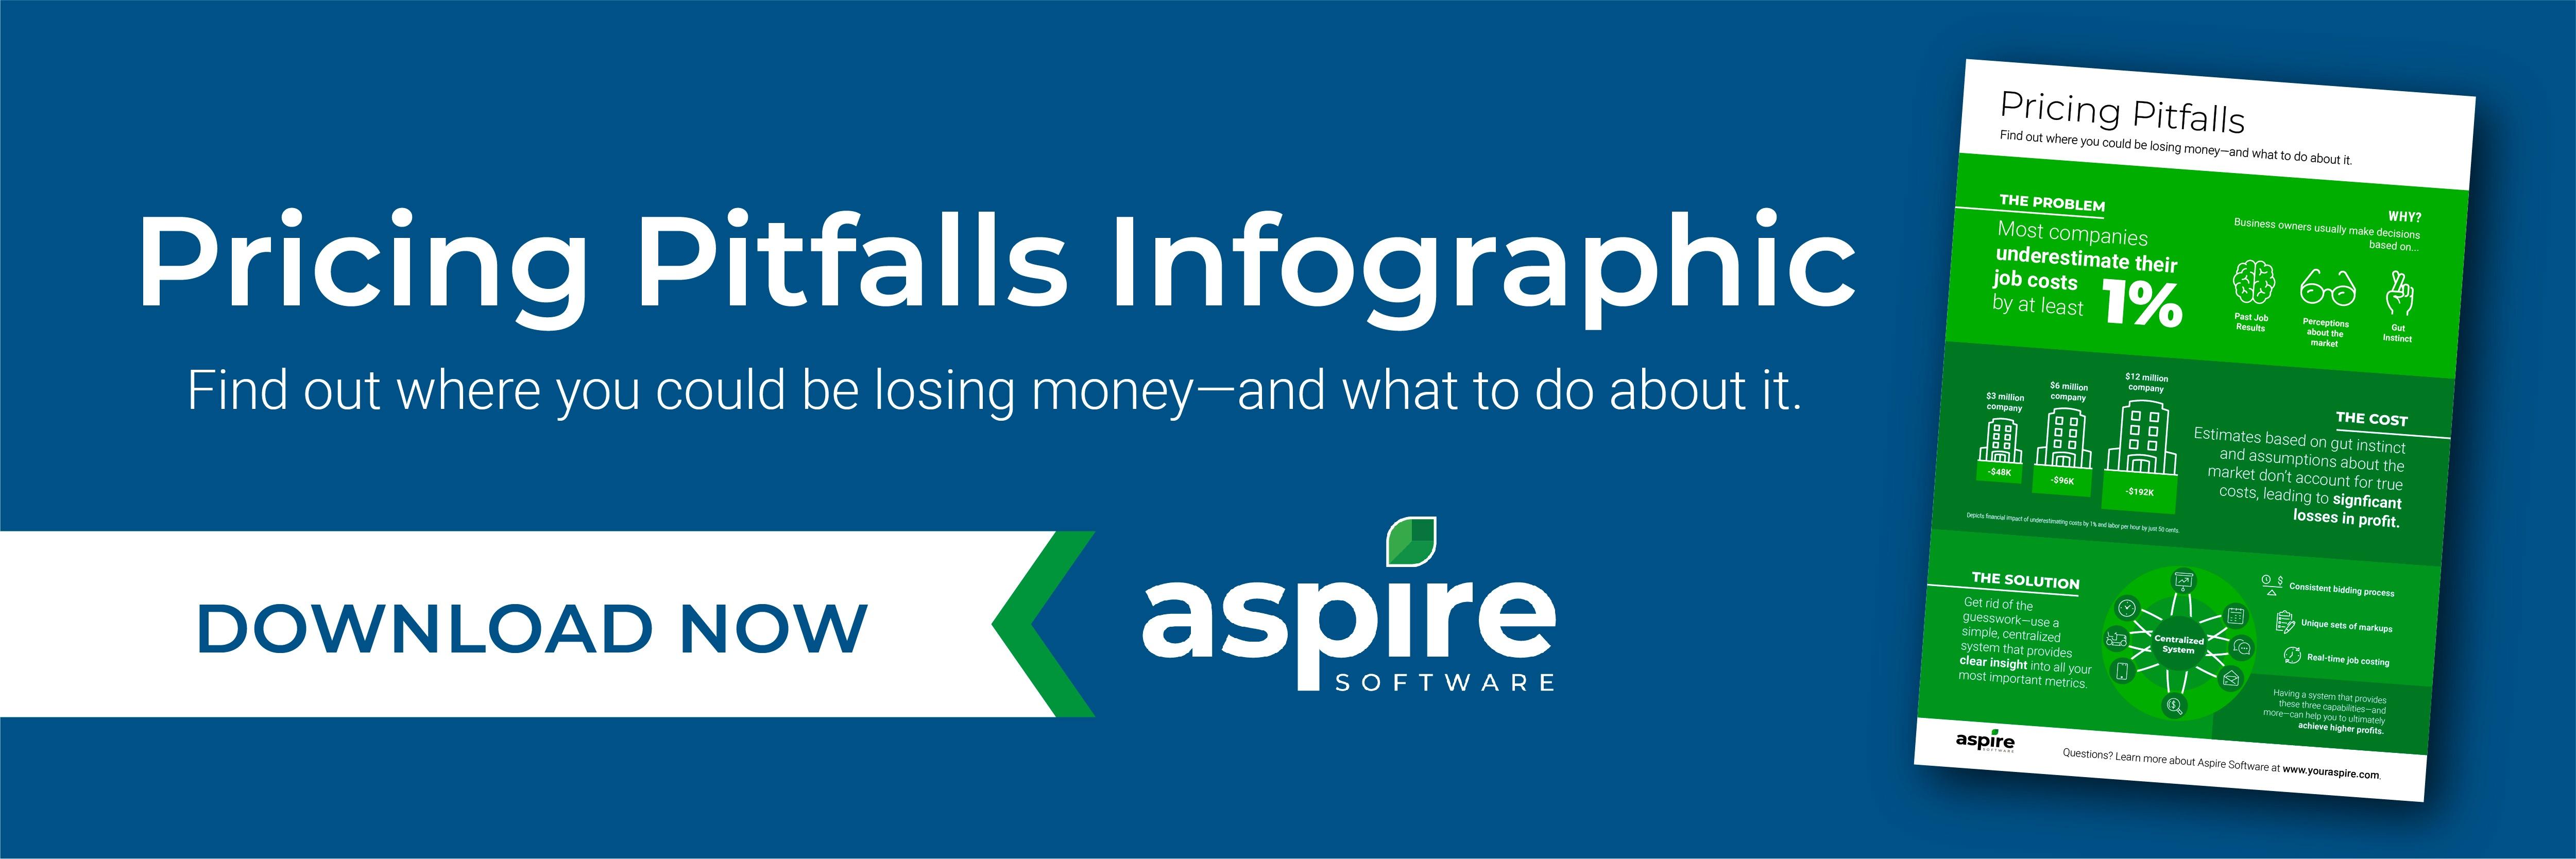 Pricing Pitfalls Infographic